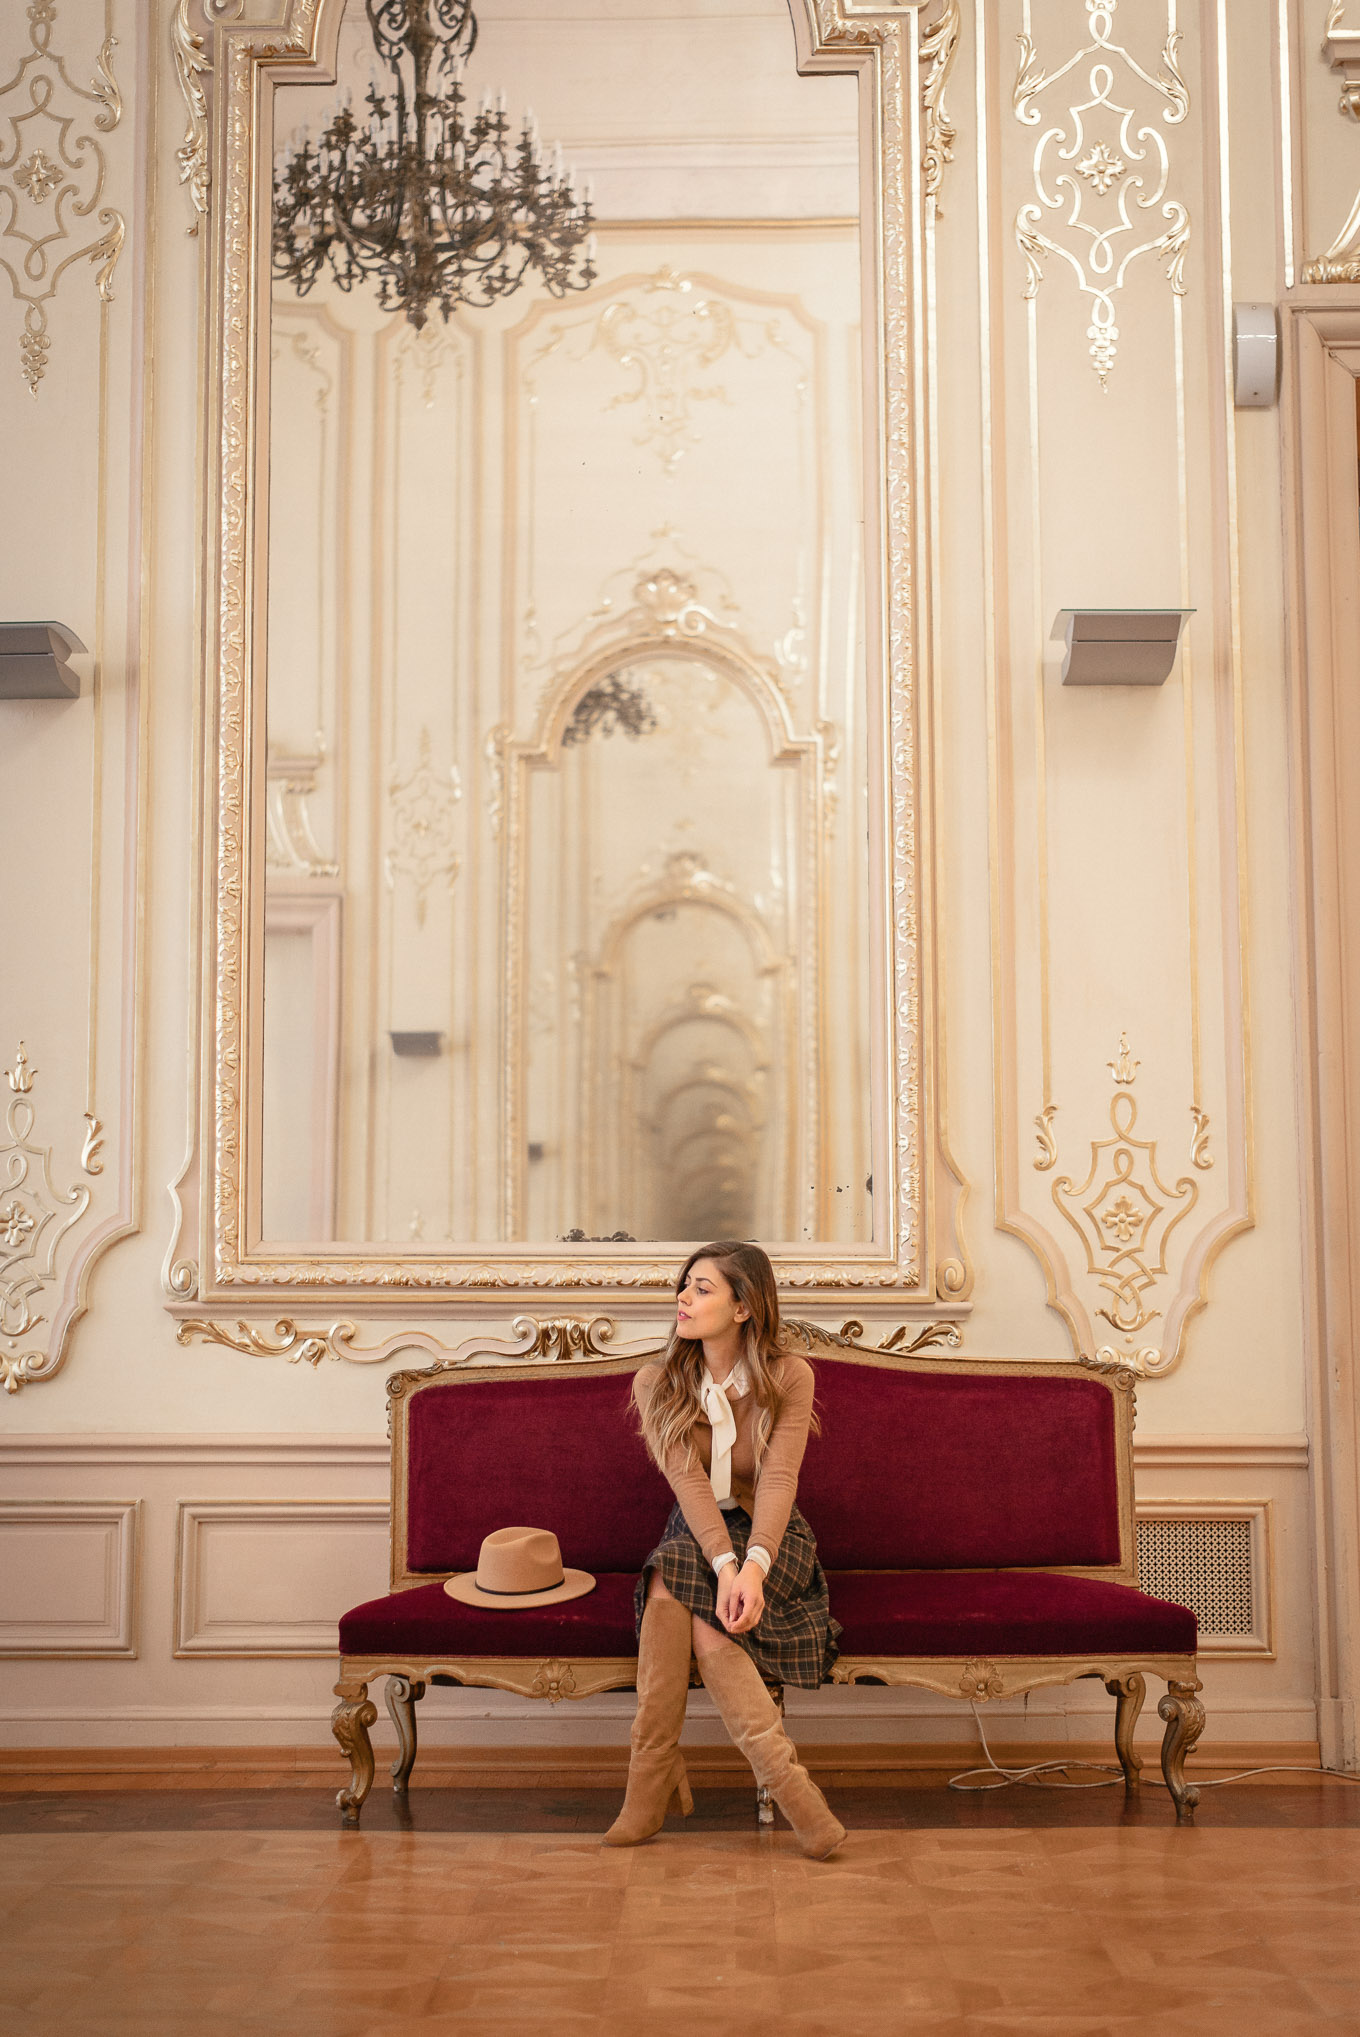 Royal french fashion blogger